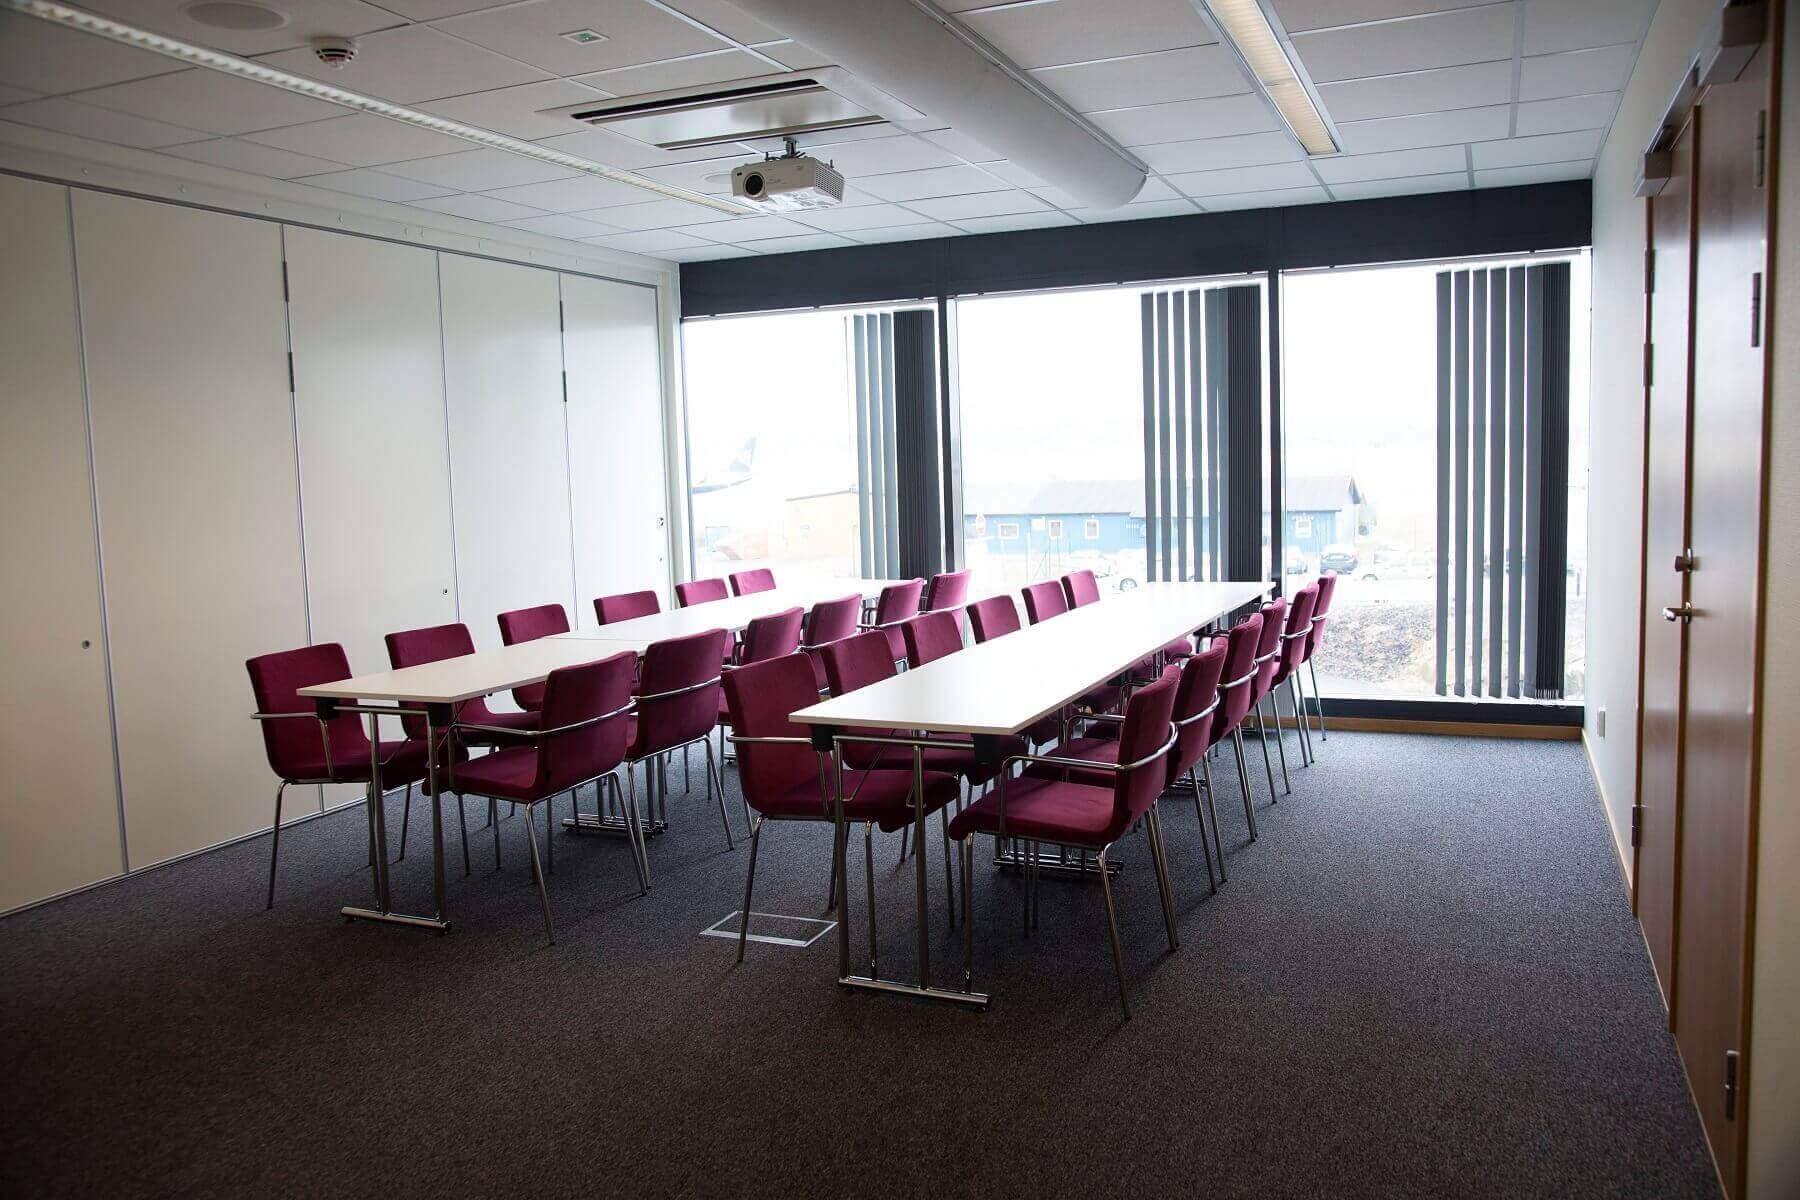 Billiga konferensrum och konferenslokaler i Göteborg - Boka nu ... 8d77d5e620f34